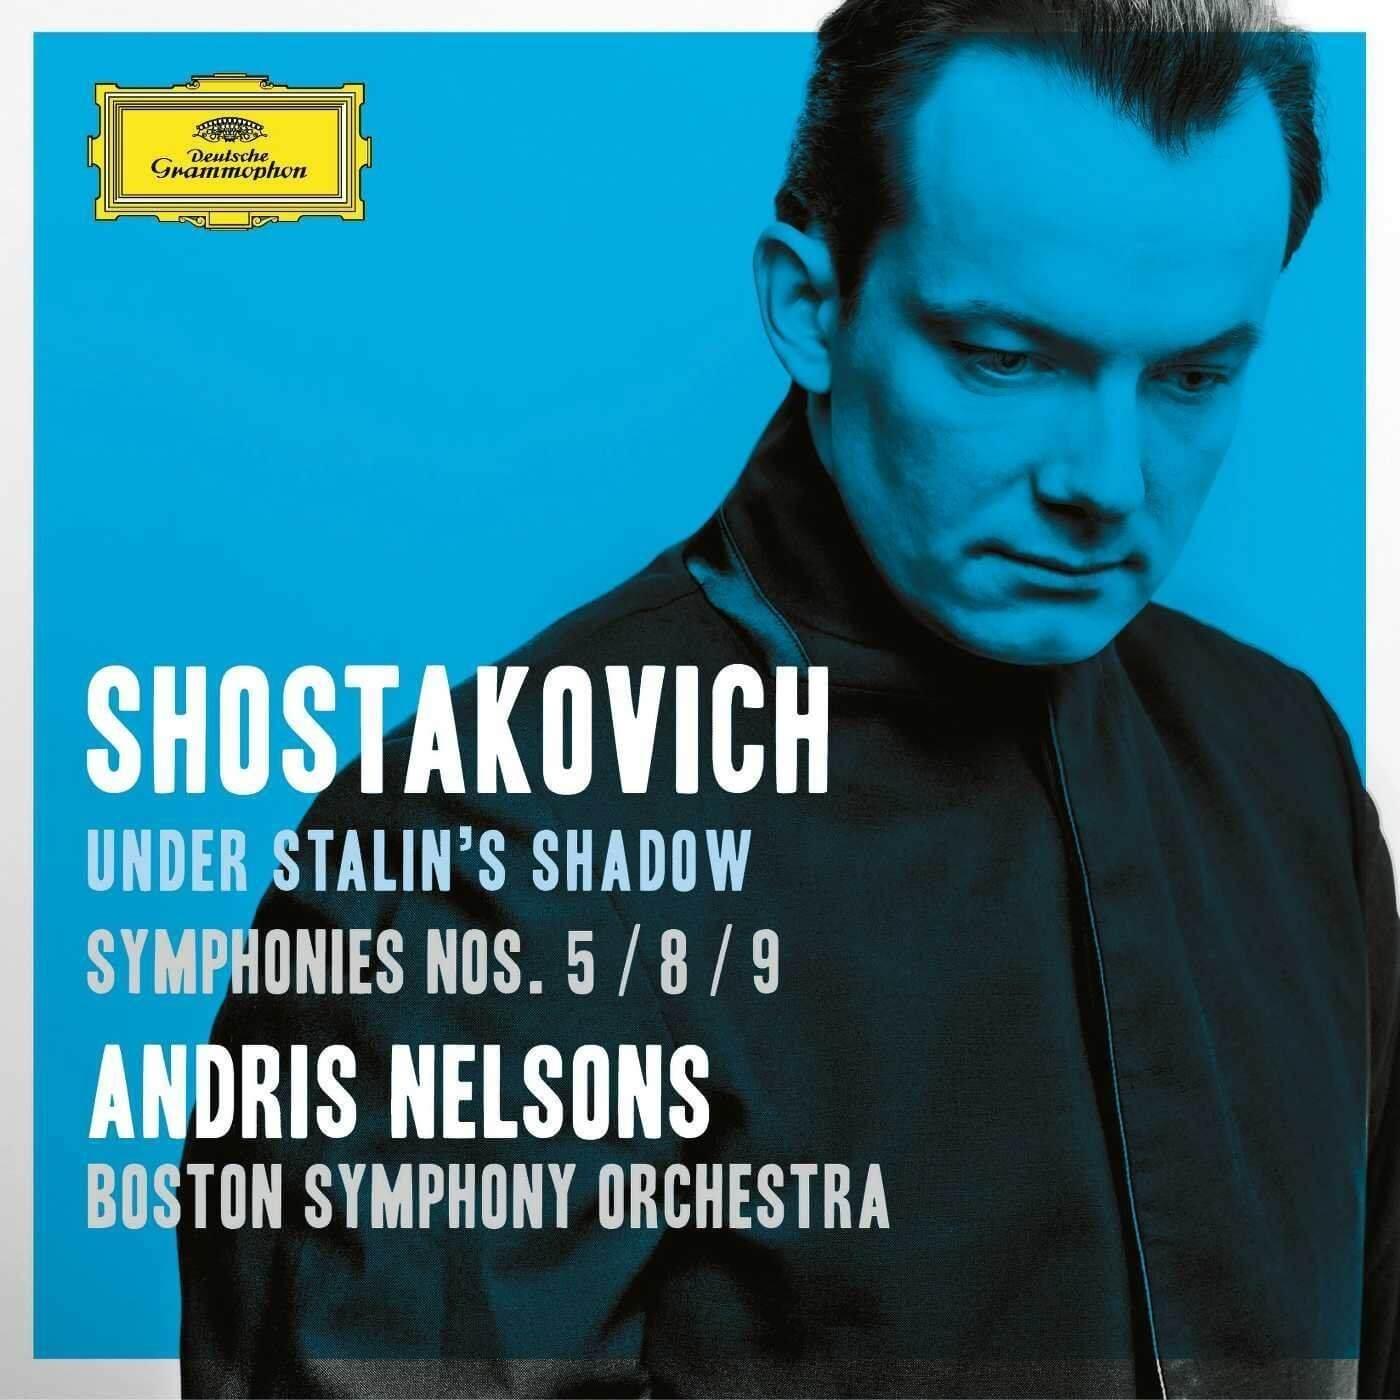 Andris Nelsons / Boston Symphony Orchestra Shostakovich: Under Stalin's Shadow — Sym Nos. 5; 8 & 9